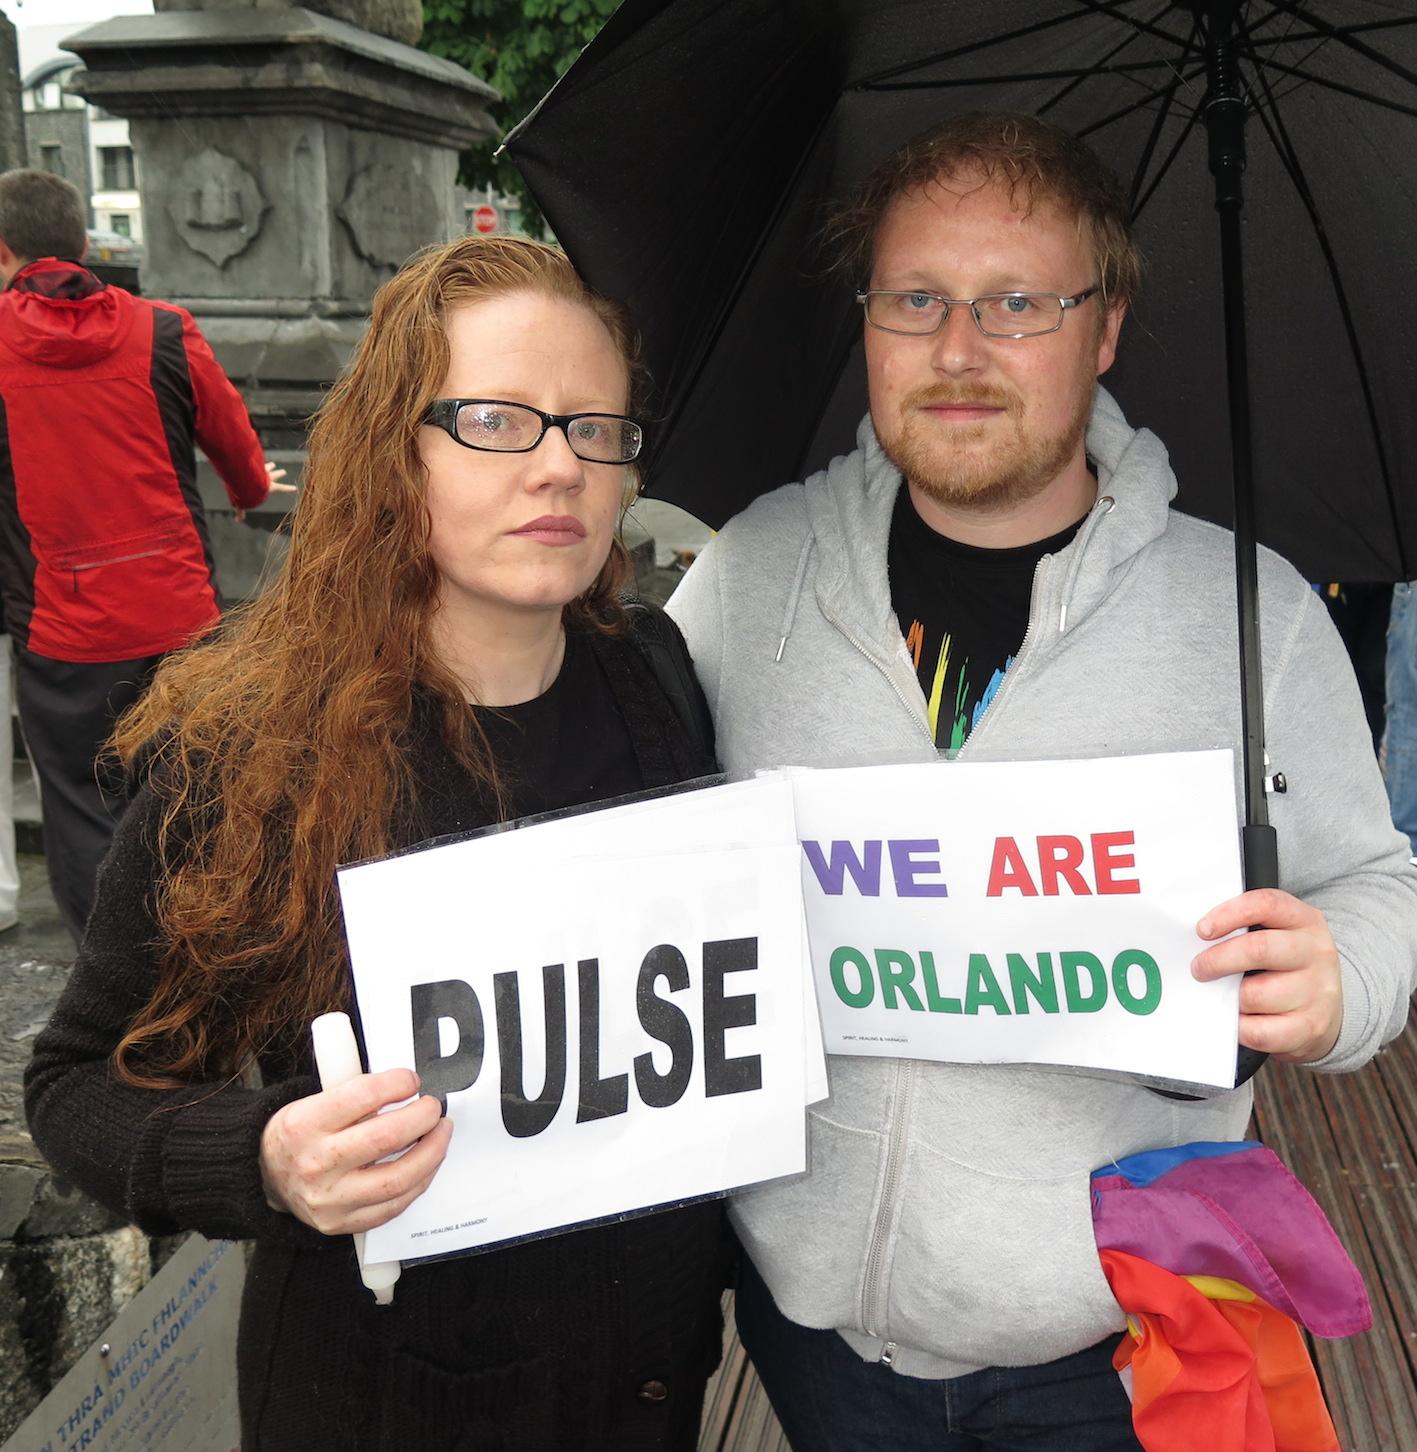 Limerick LGBT Community honour Orlando victims